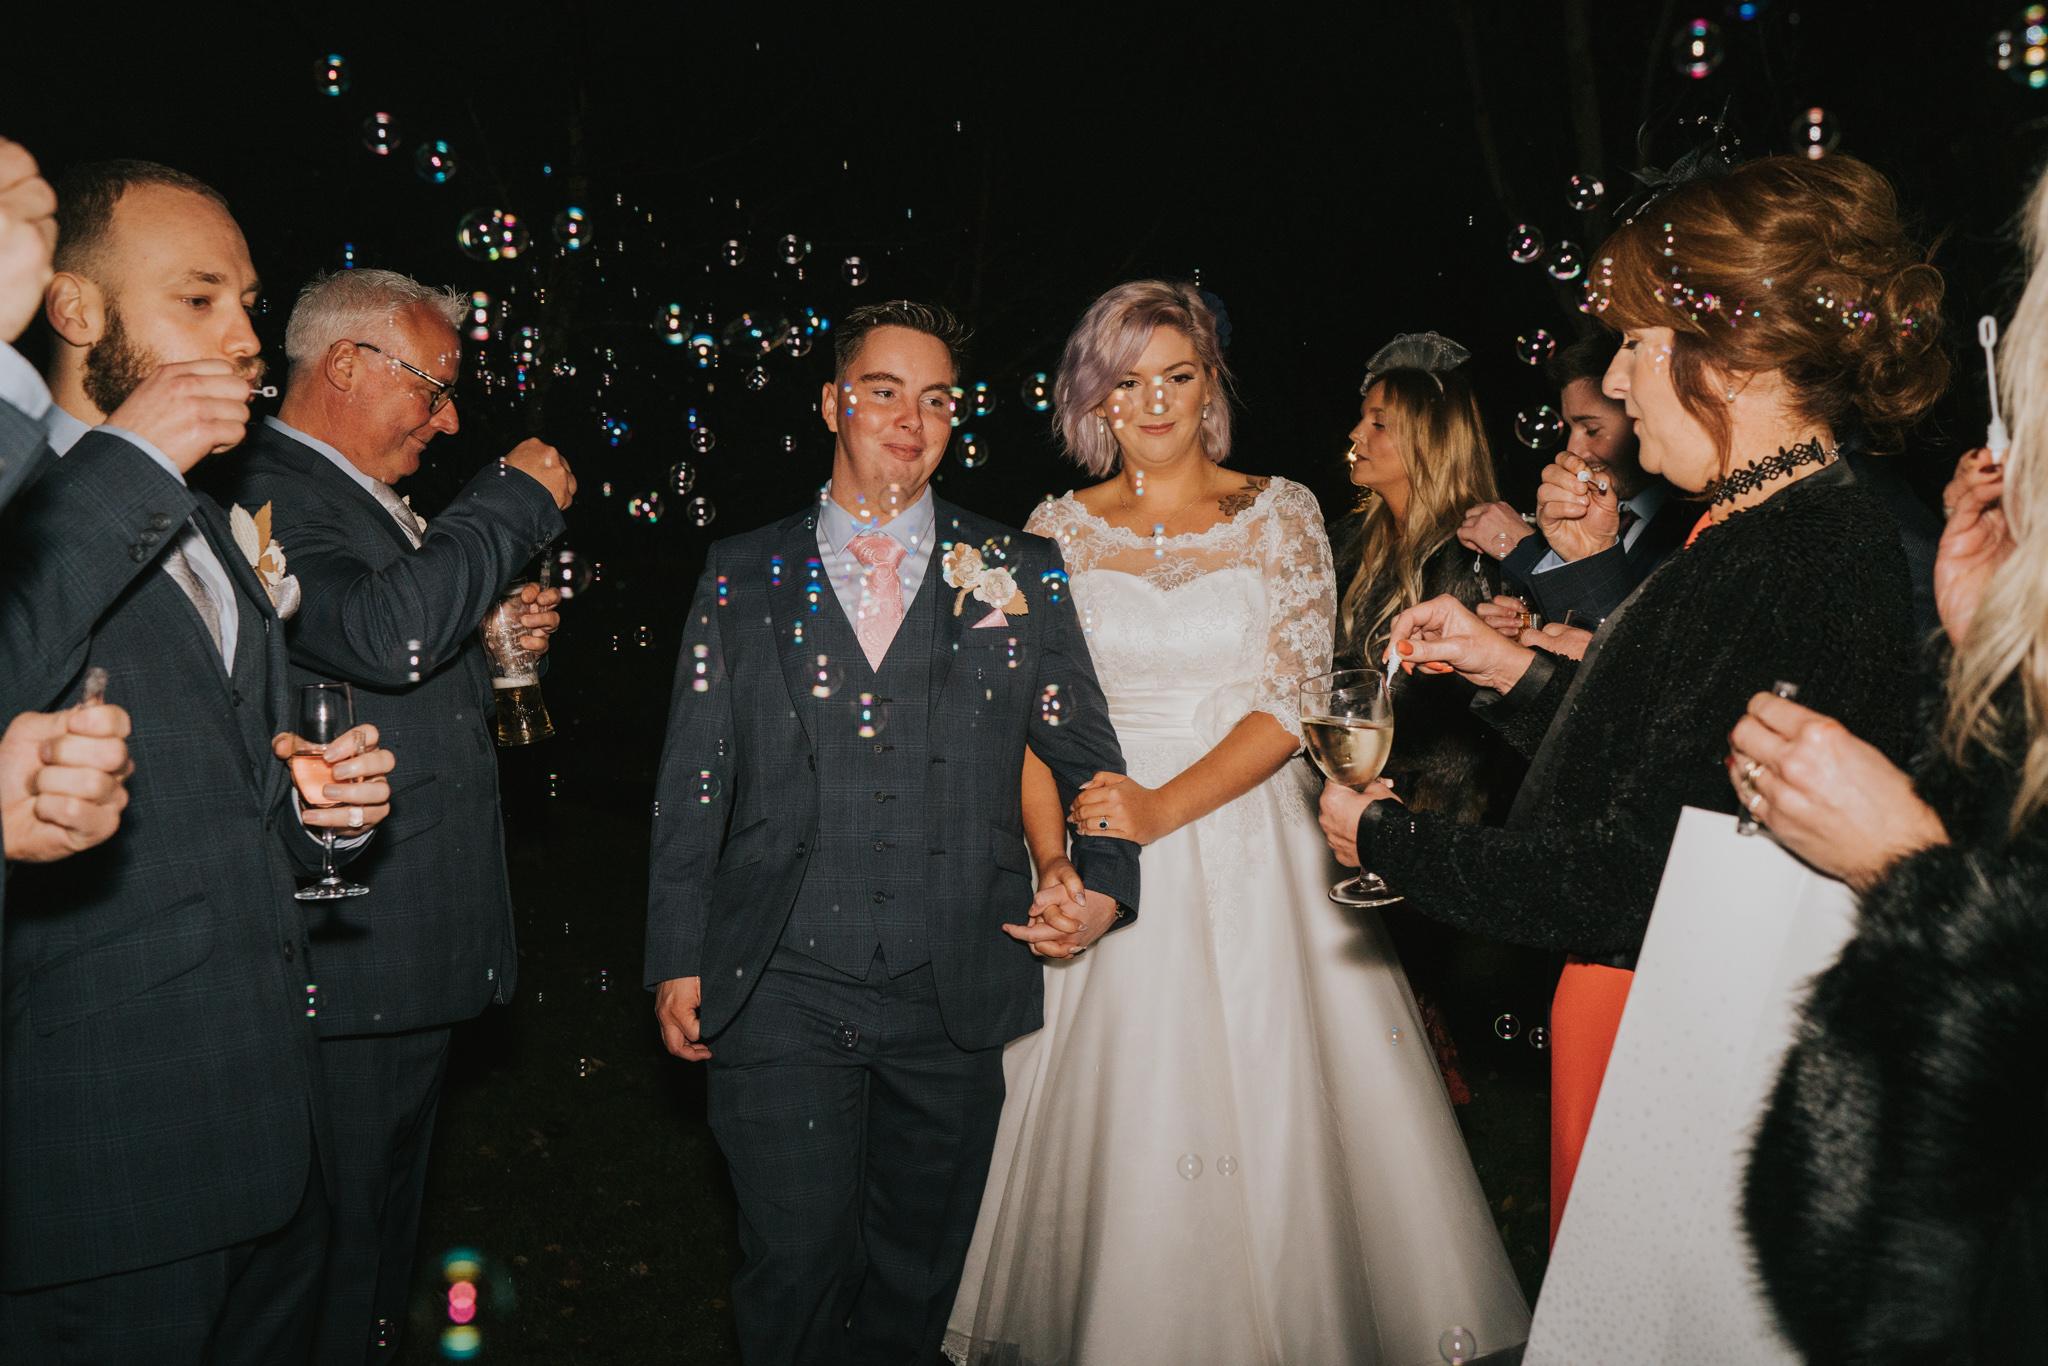 rhia-james-rustic-crabbs-barn-vintage-50s-retro-wedding-grace-elizabeth-colchester-essex-alternative-relaxed-wedding-family-photography-devon-suffolk-norfolk-essex (110 of 138).jpg